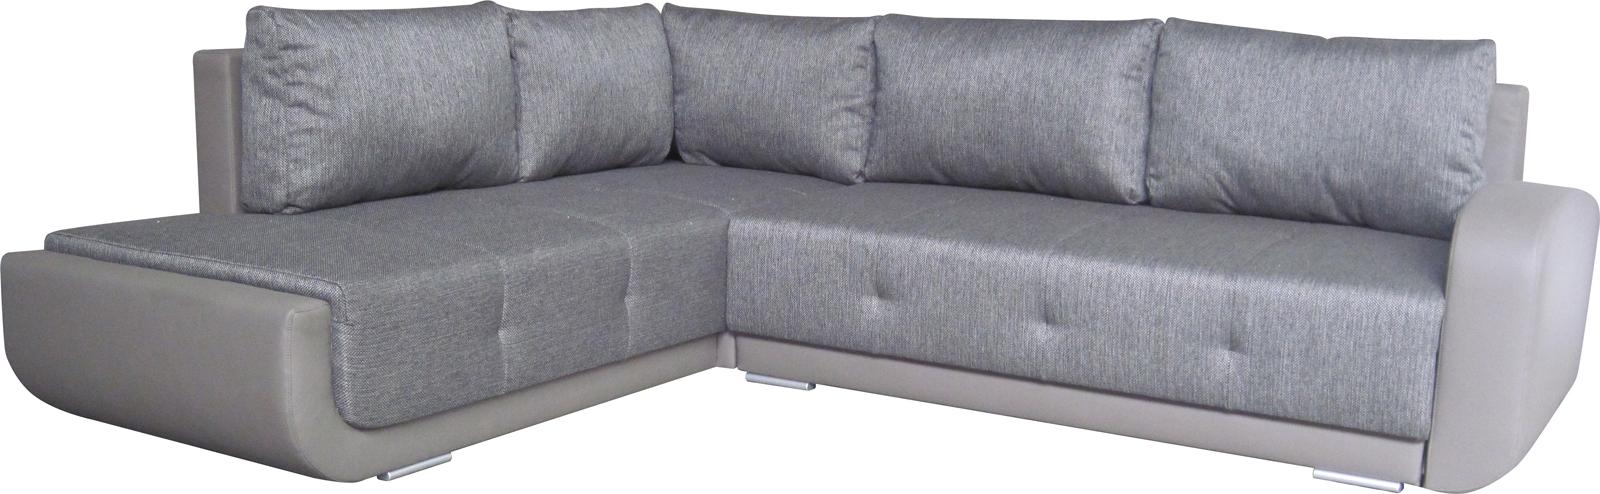 Rohová sedačka - BRW - Swing Lux REC.3DL šedá (L)